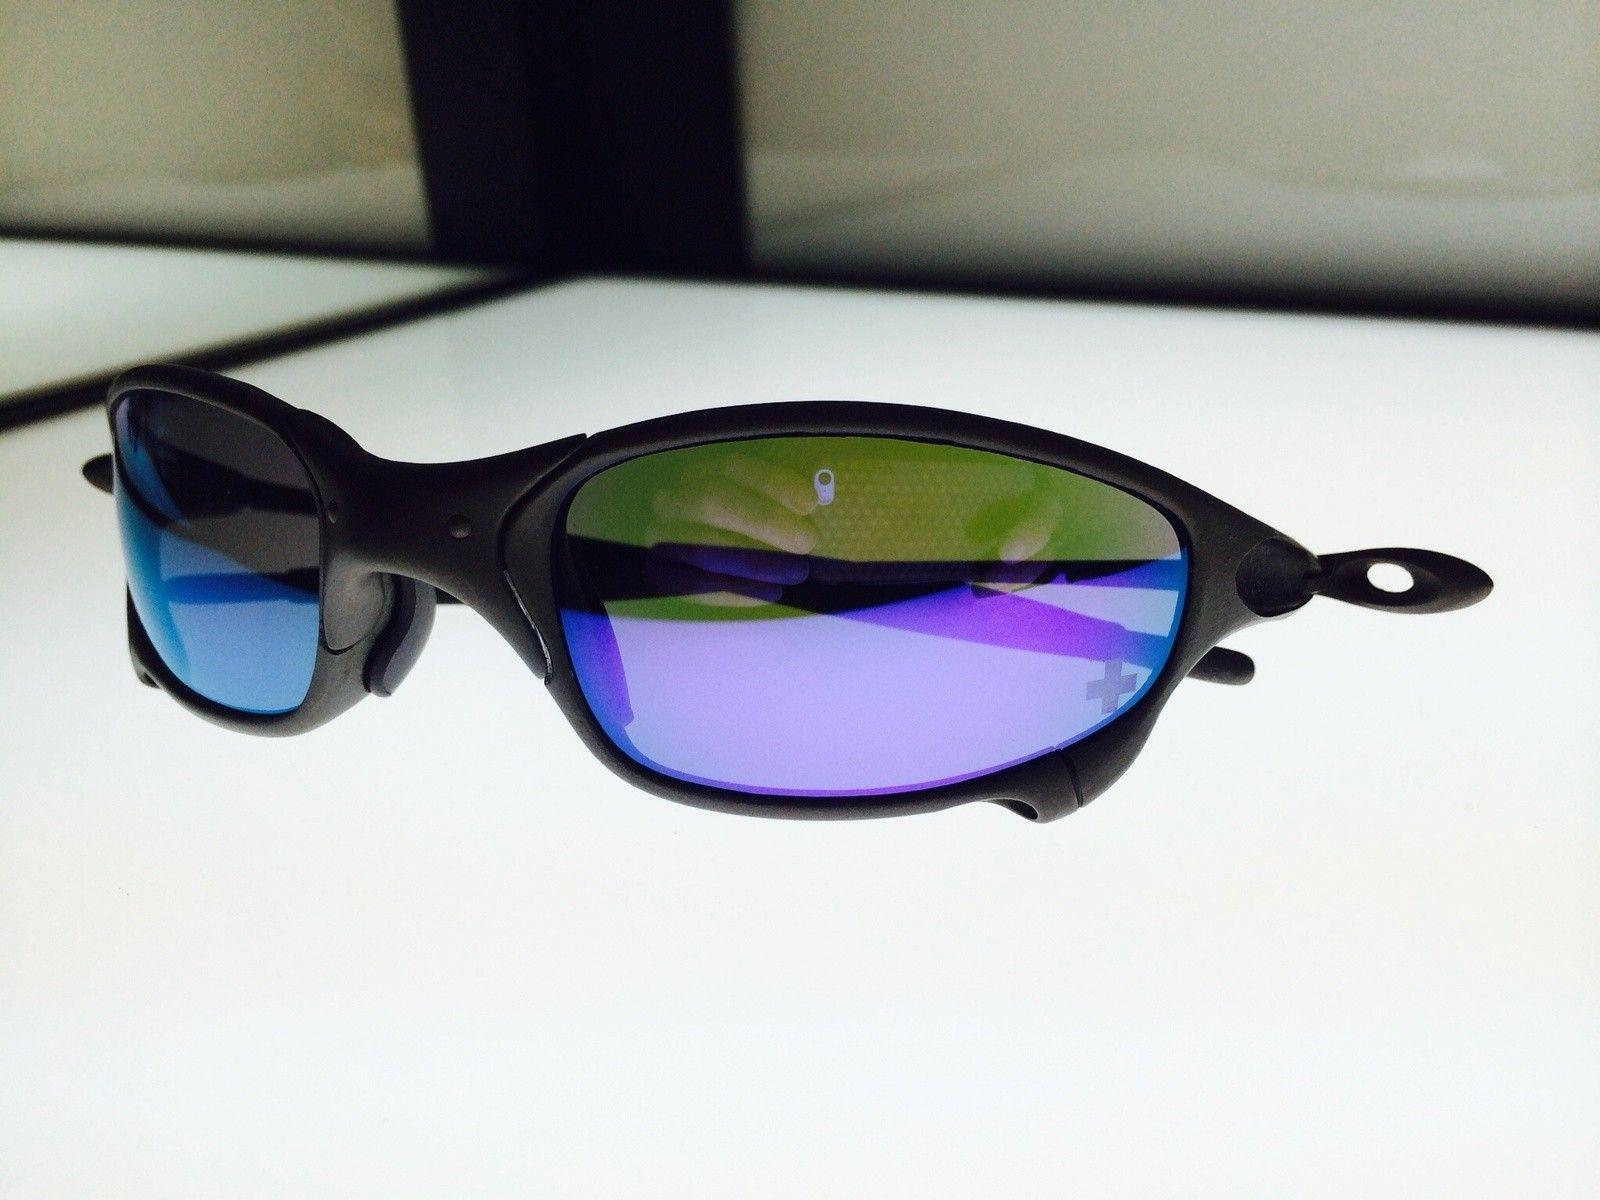 "Juliet Xmetal frame 1st gen / Intinity Hero lenses ""violet"" J*serial *** Price Drop *** - image.jpg"